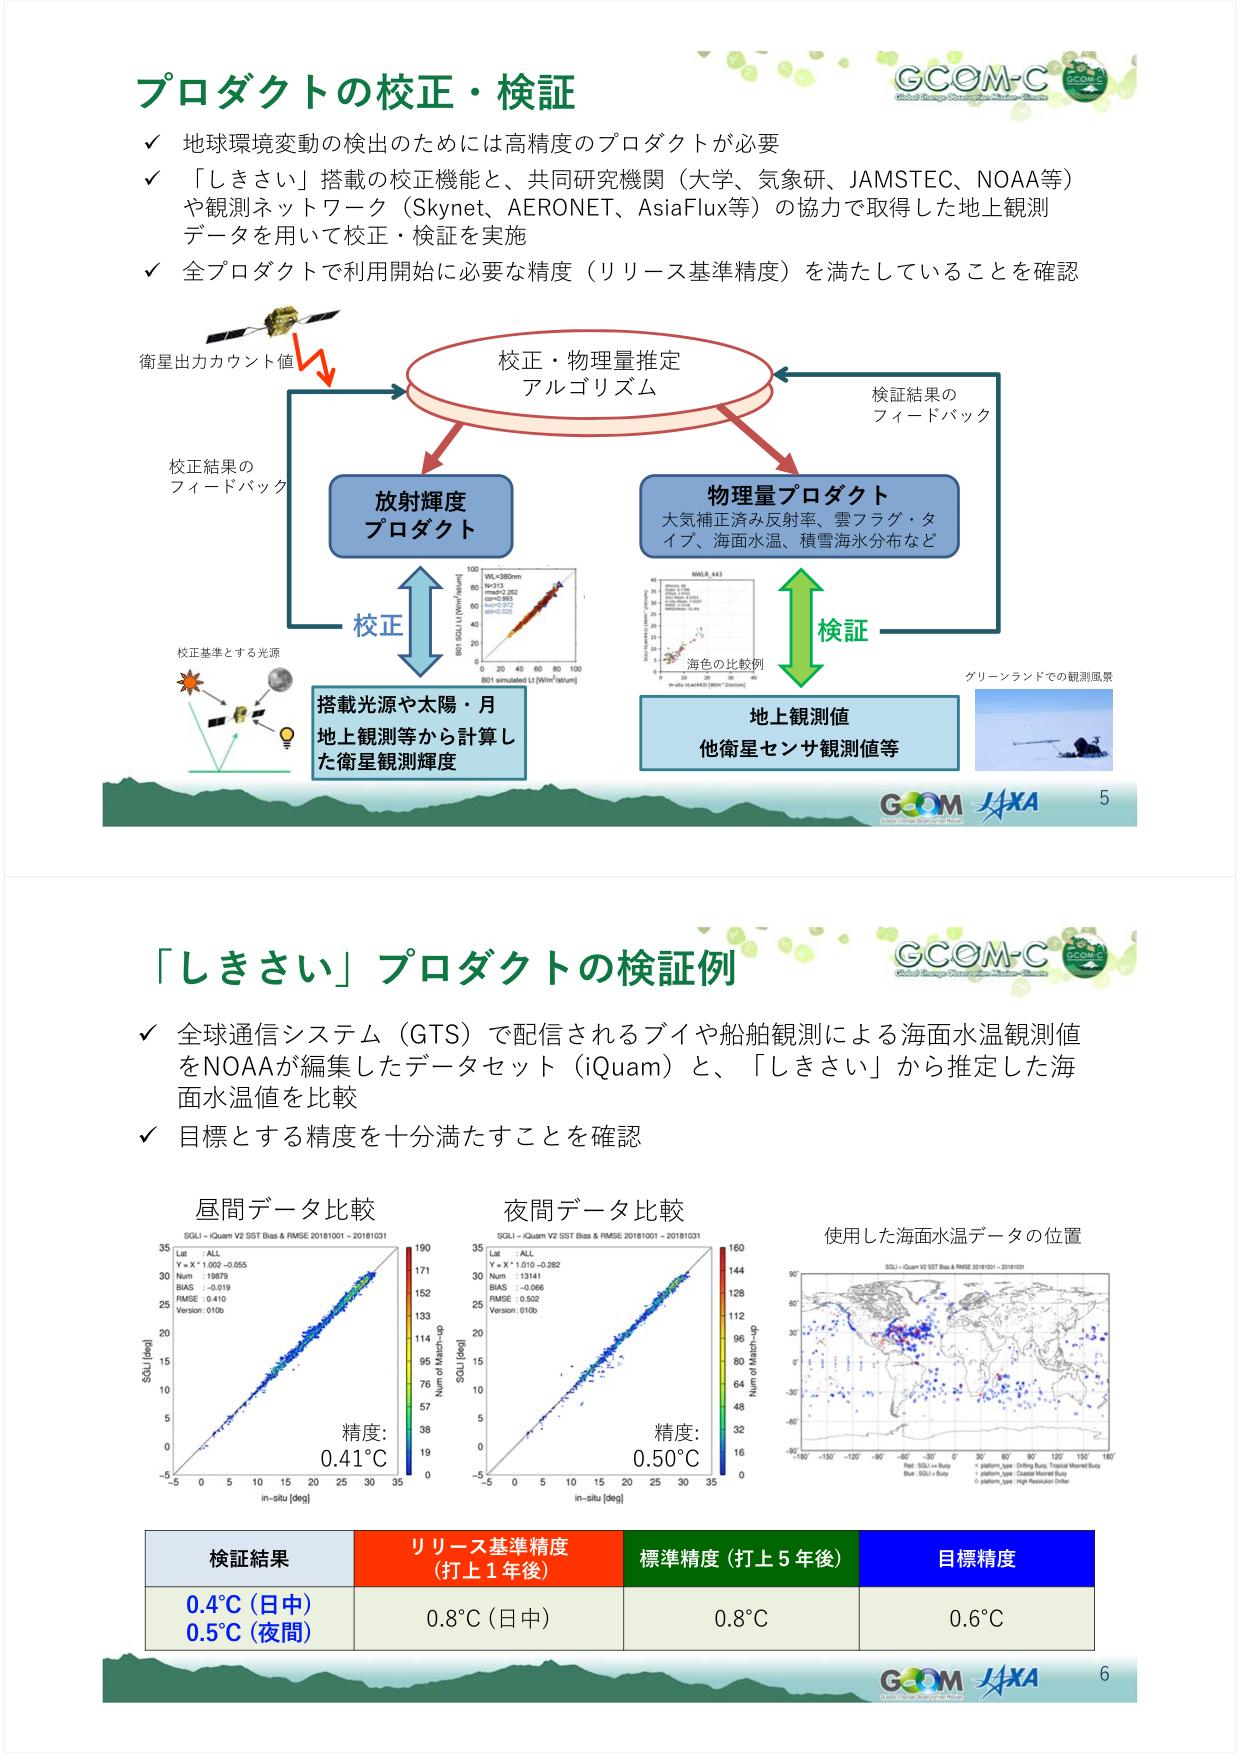 f:id:Imamura:20181220152512p:plain